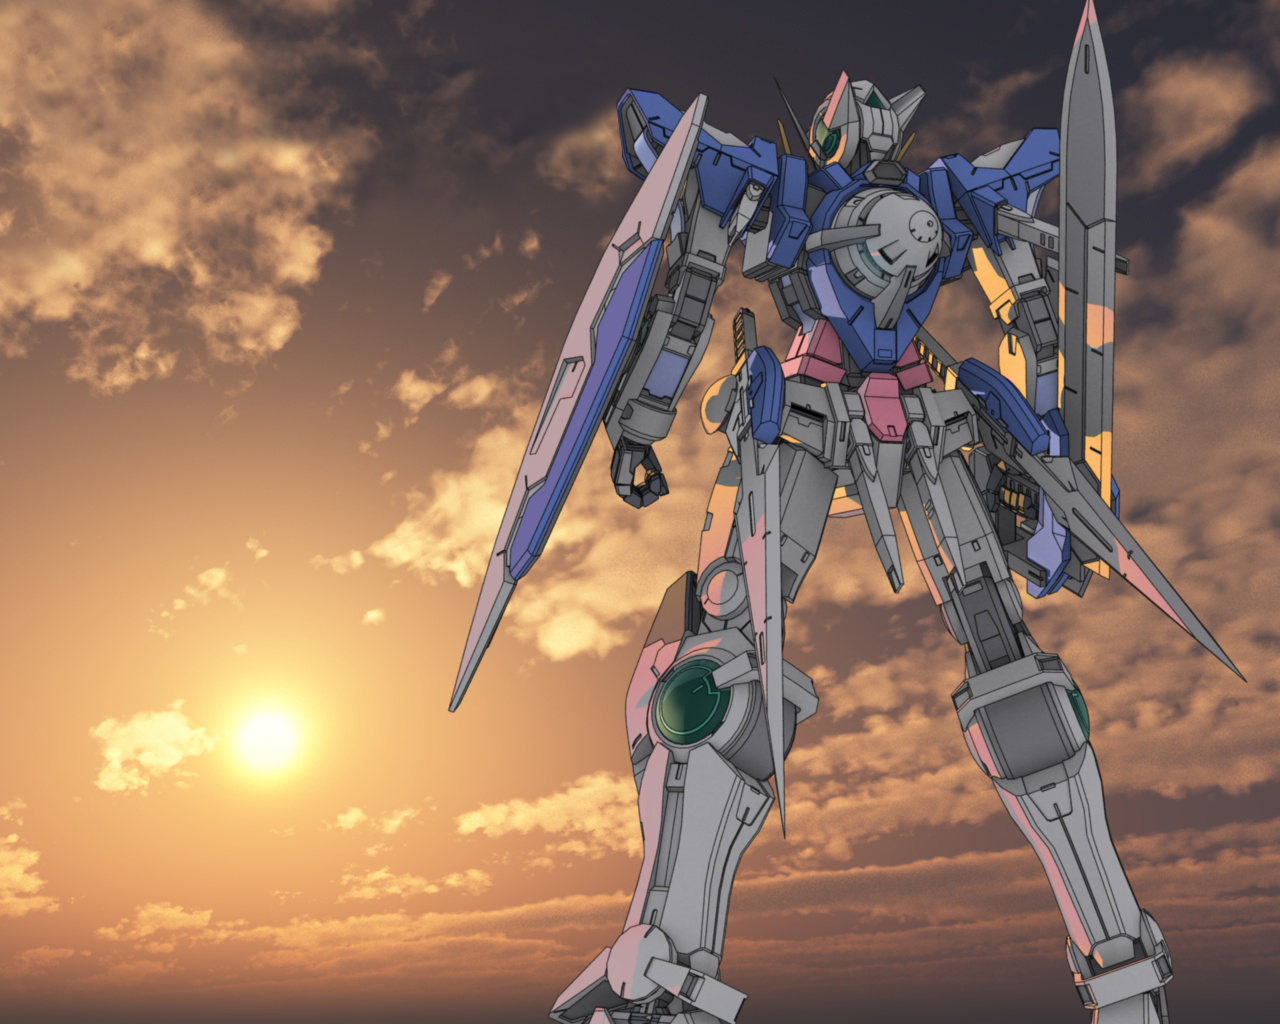 Gundam Background Wallpapers WIN10 THEMES 1280x1024